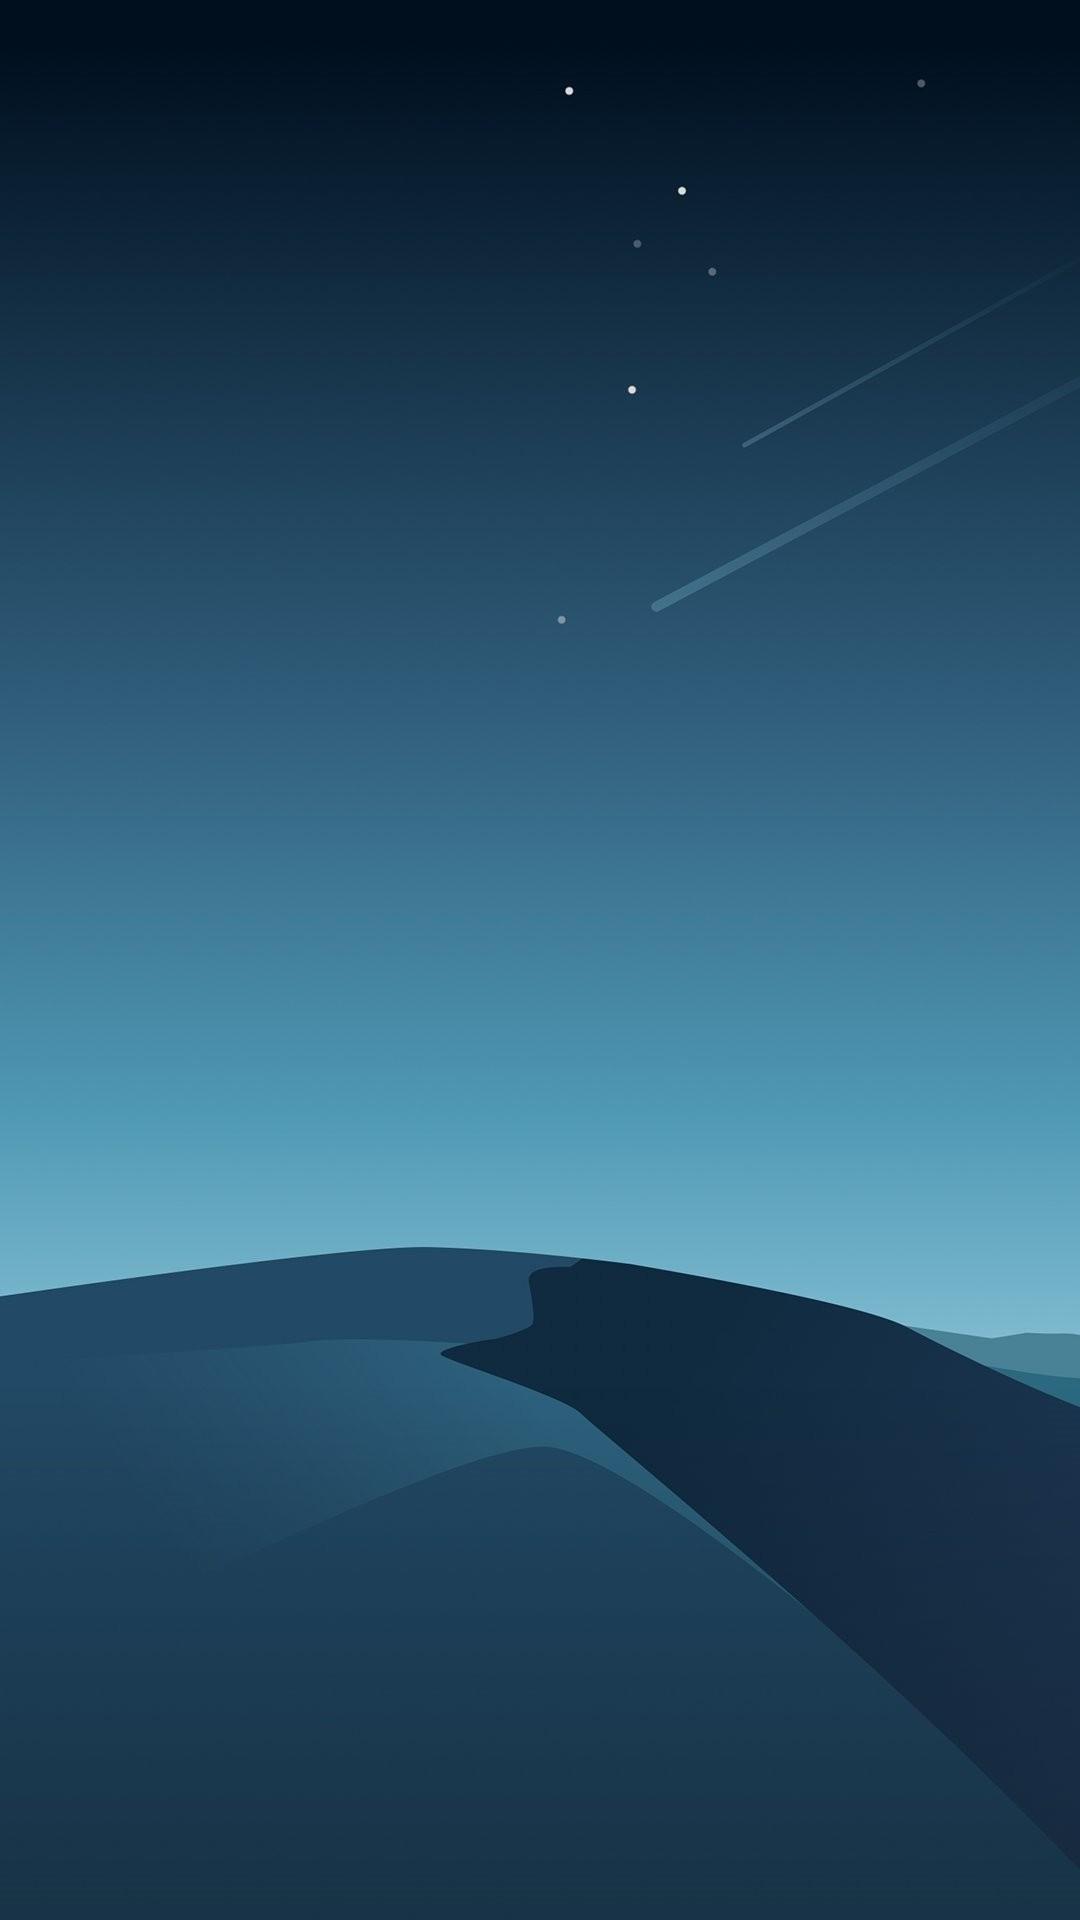 Cool Lockscreens phone background